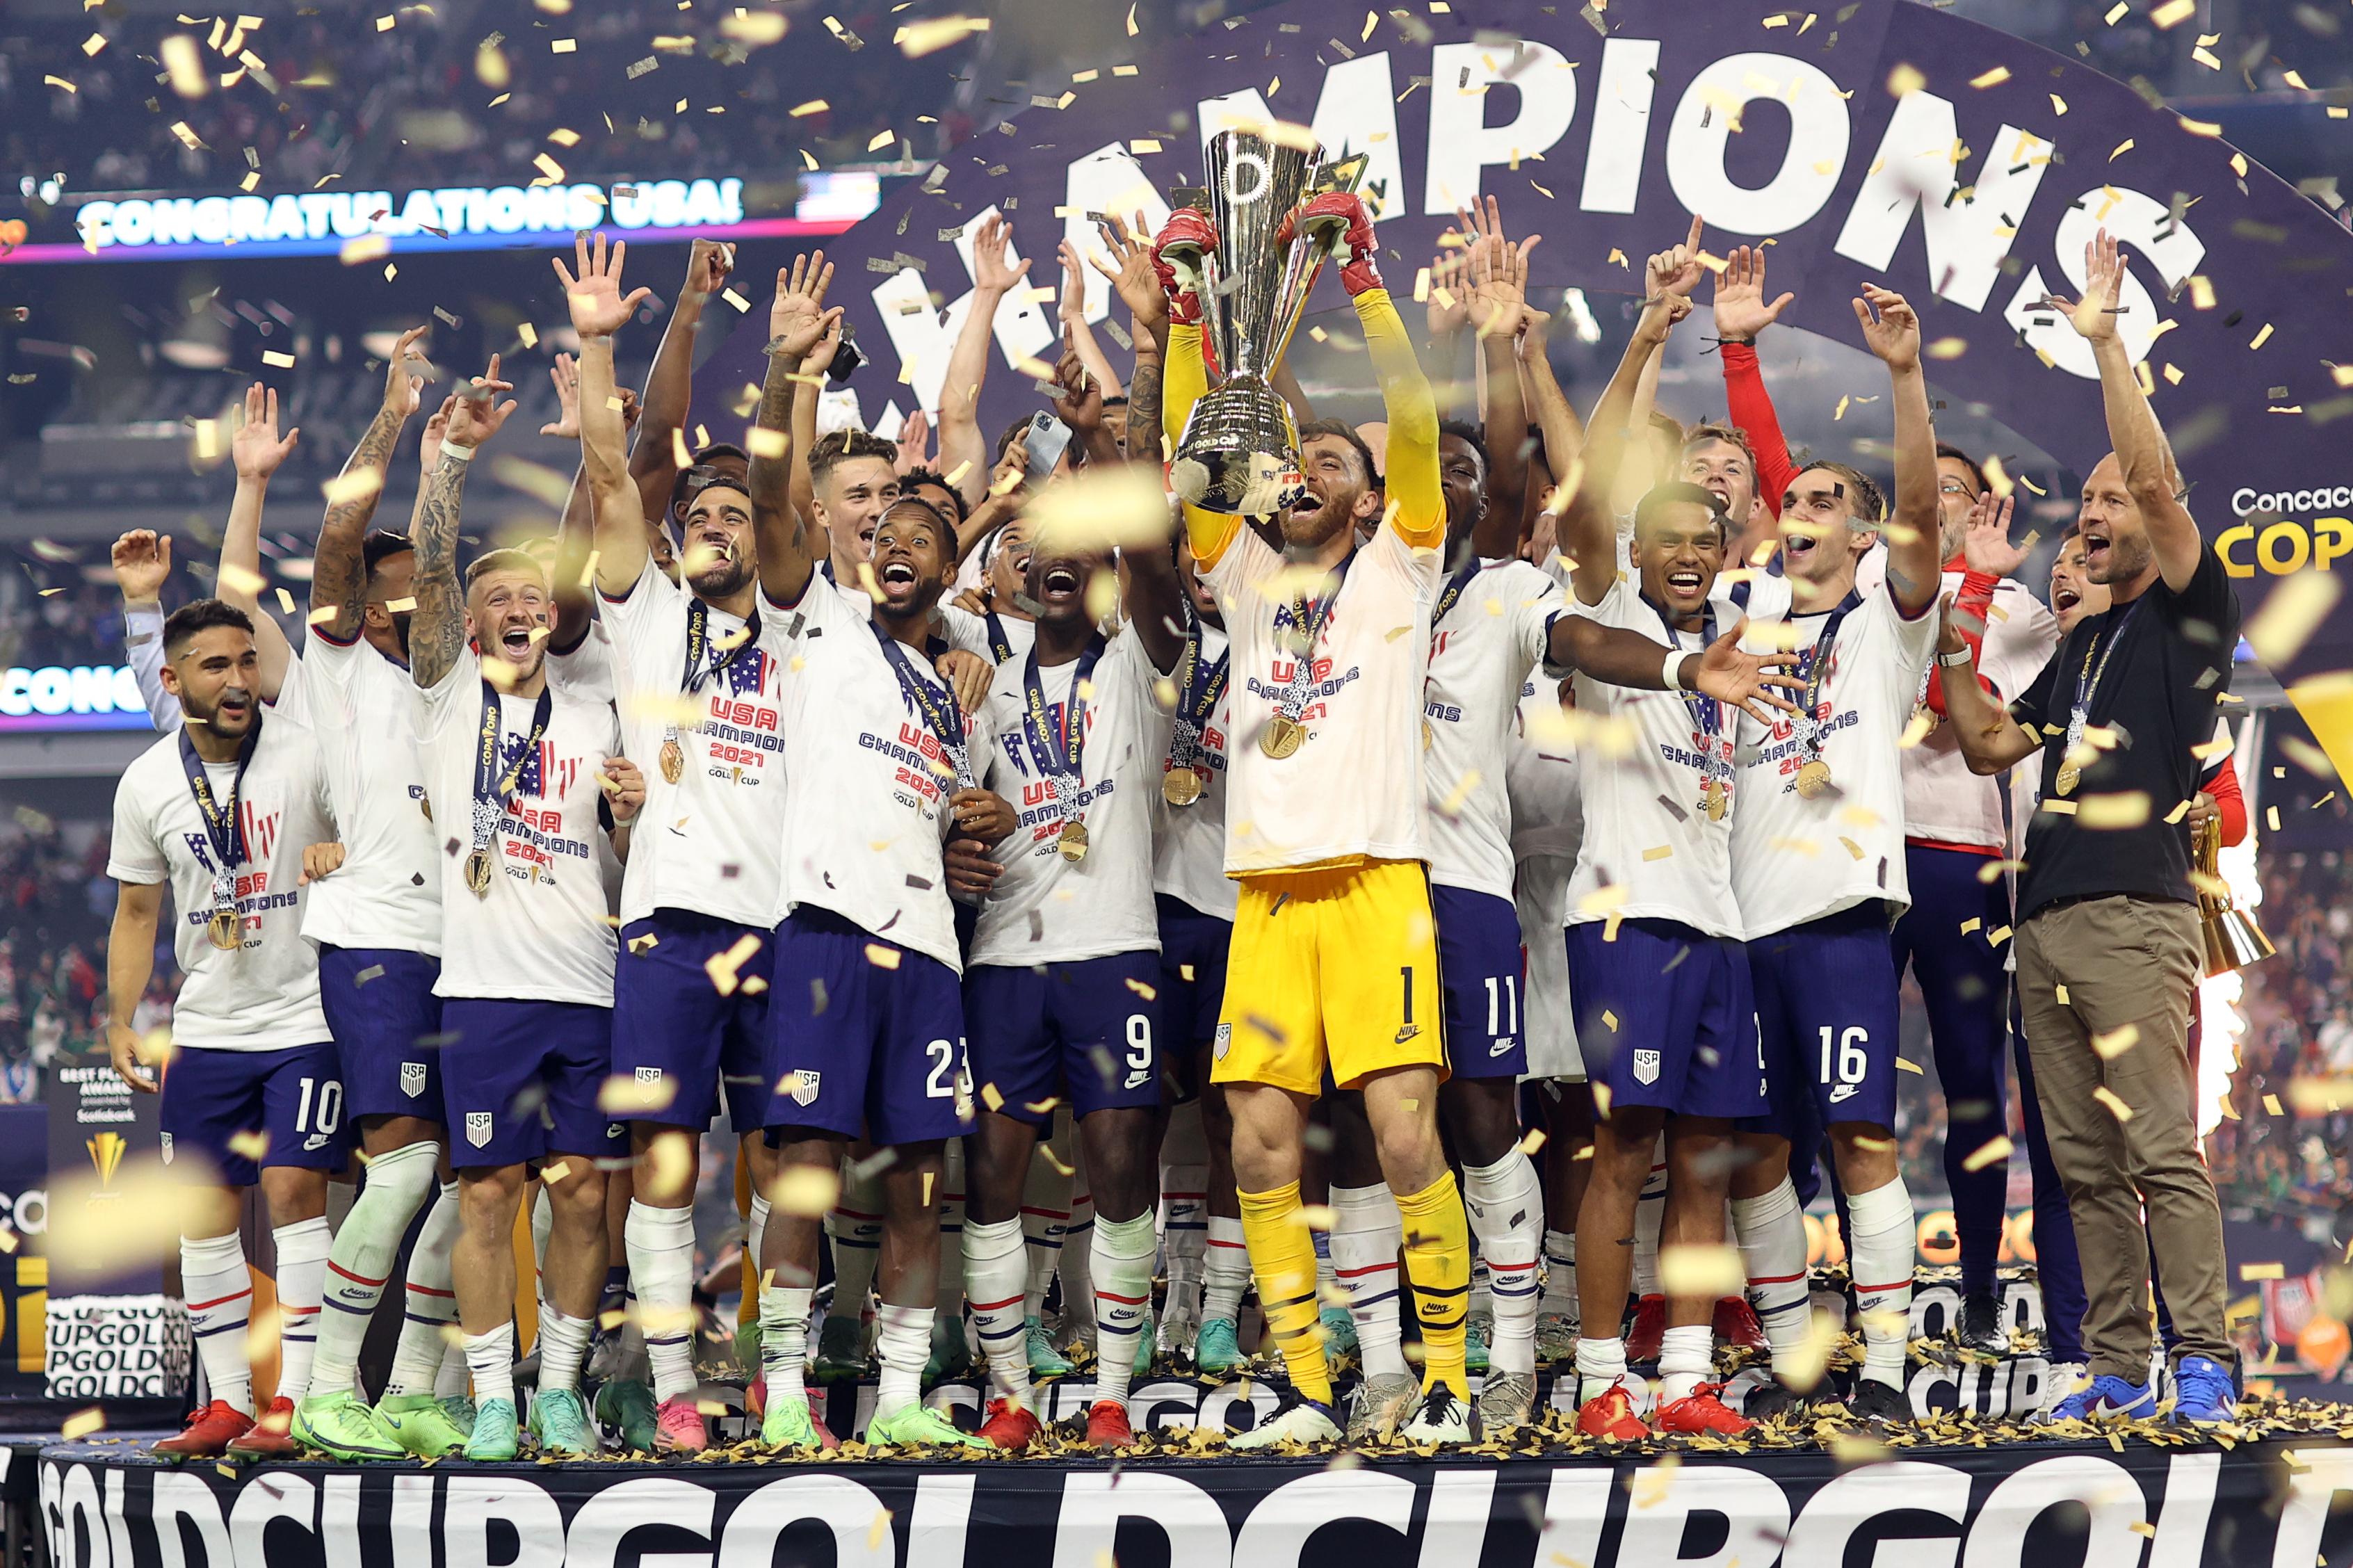 SOCCER: AUG 01 Concacaf Gold Cup Final - USA v Mexico